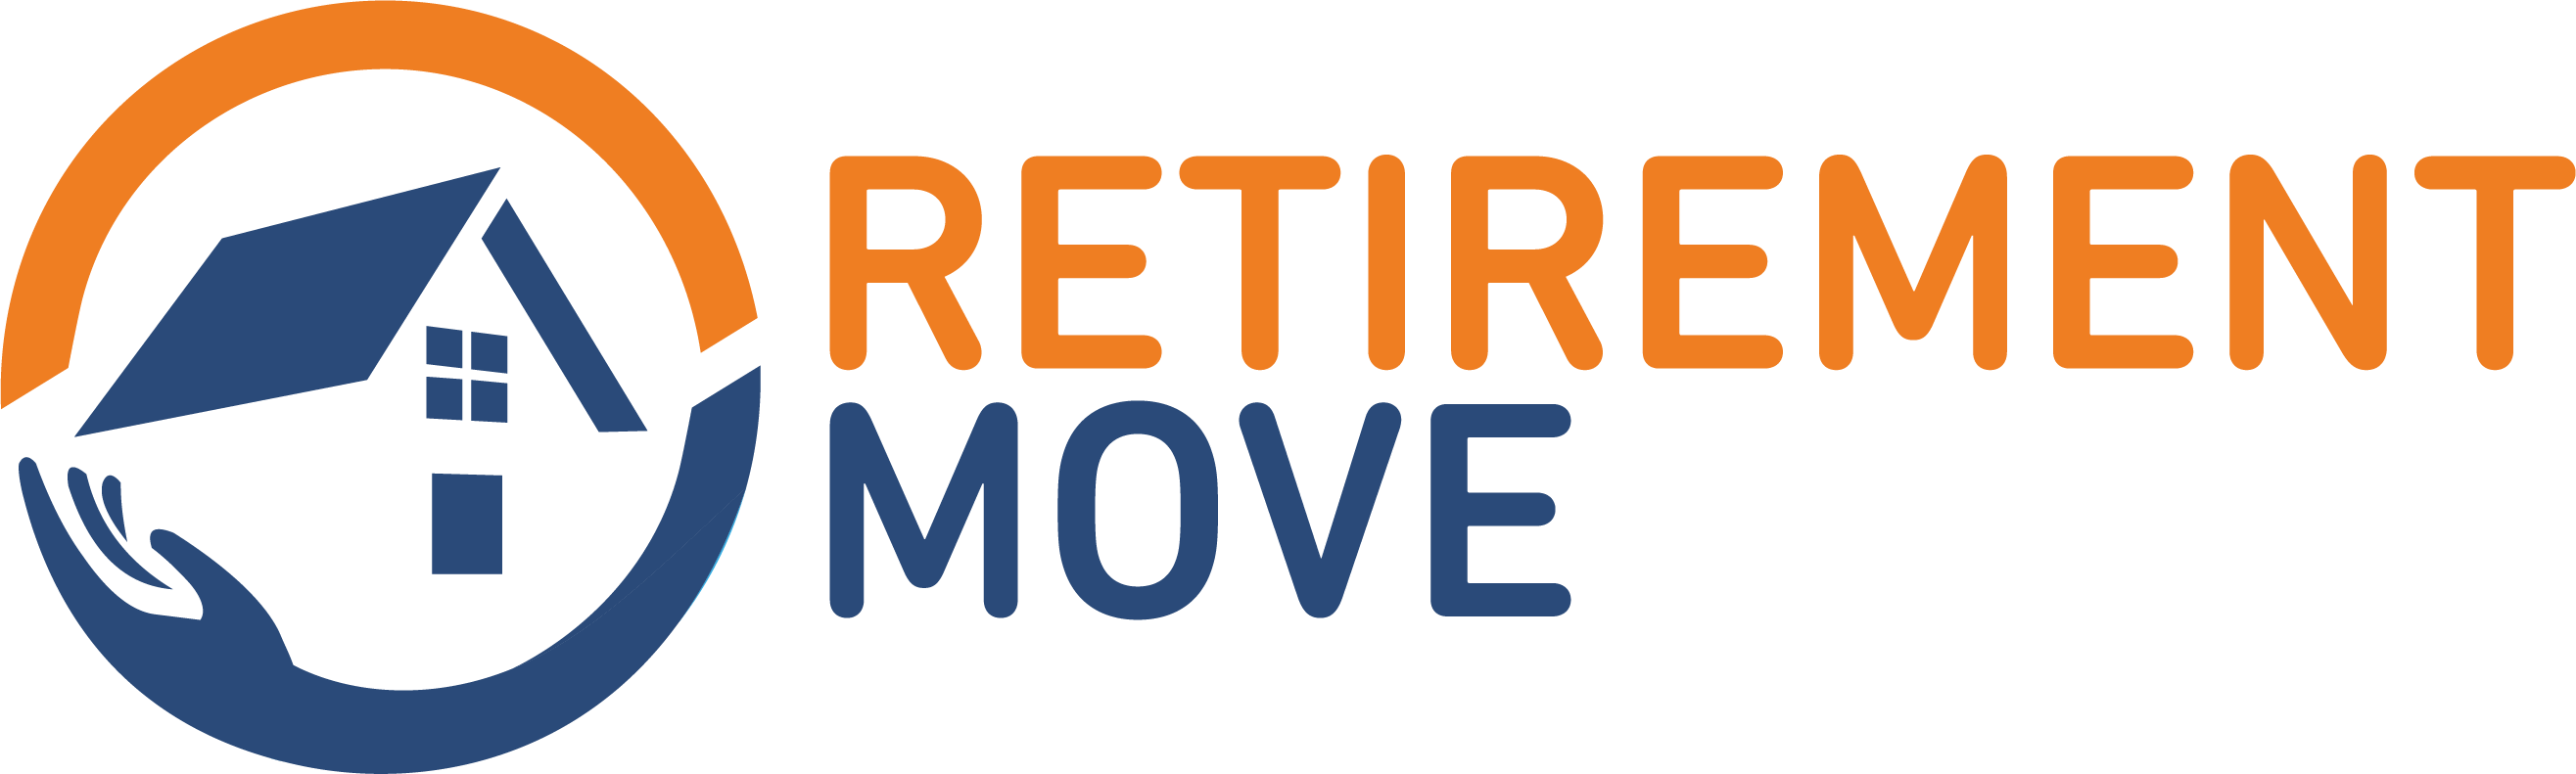 Retirement Move Logo